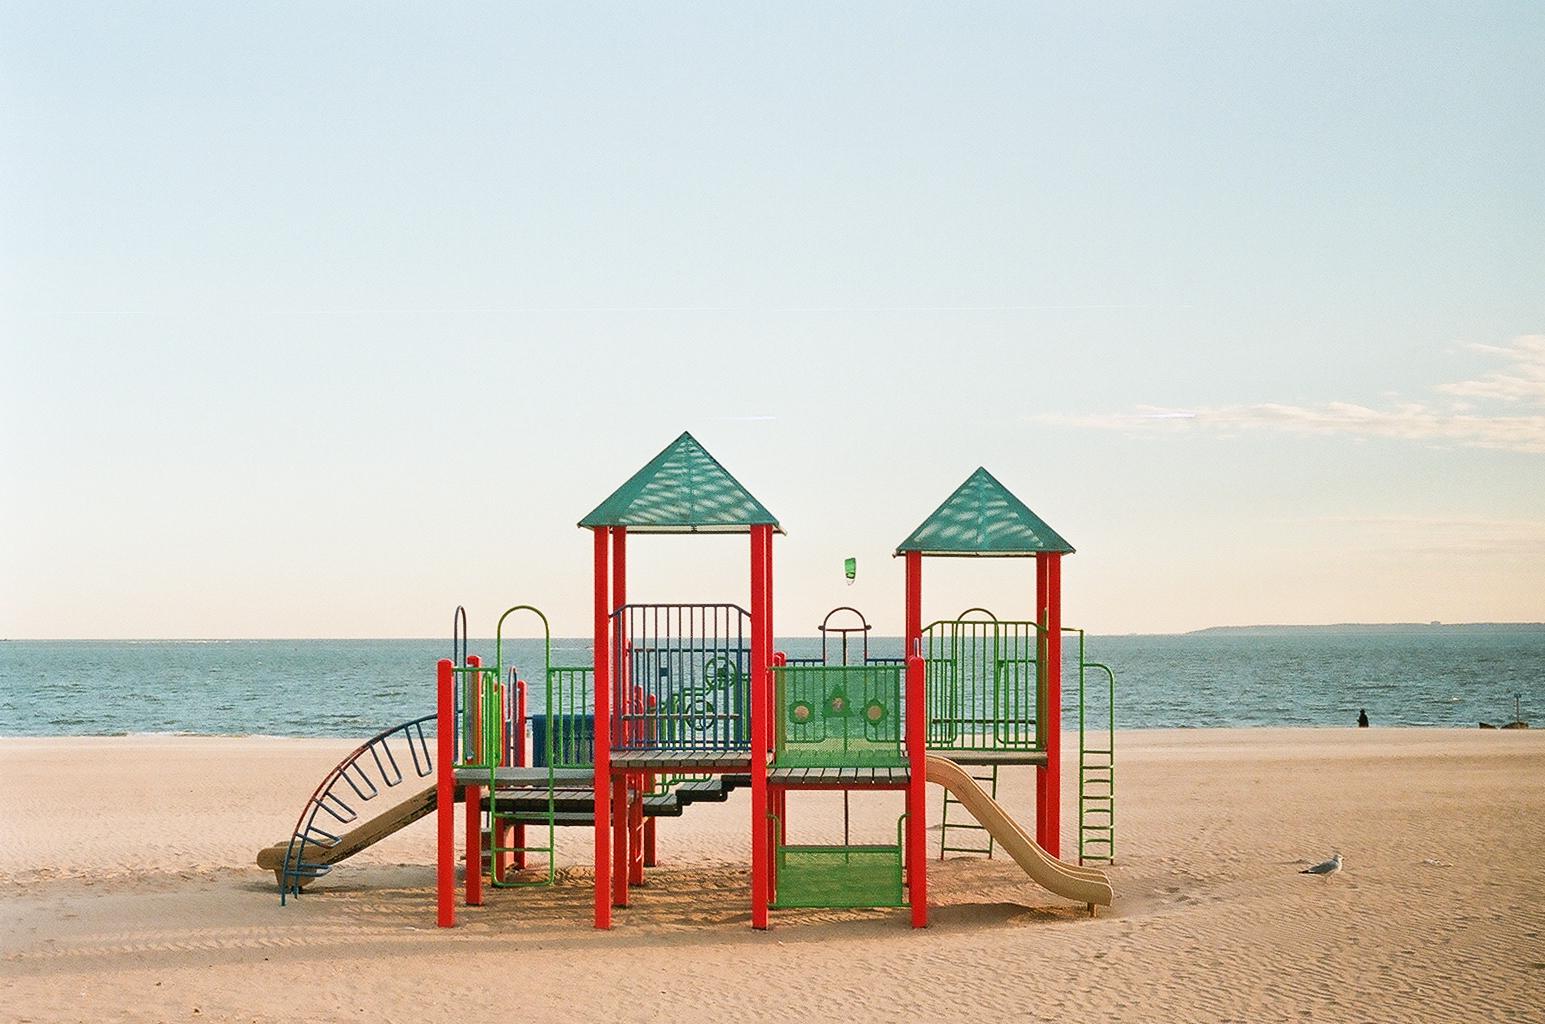 Playground, Brighton Beach, Brooklyn_Film Photography_NYC_Joe Curry Photography_2018.jpg